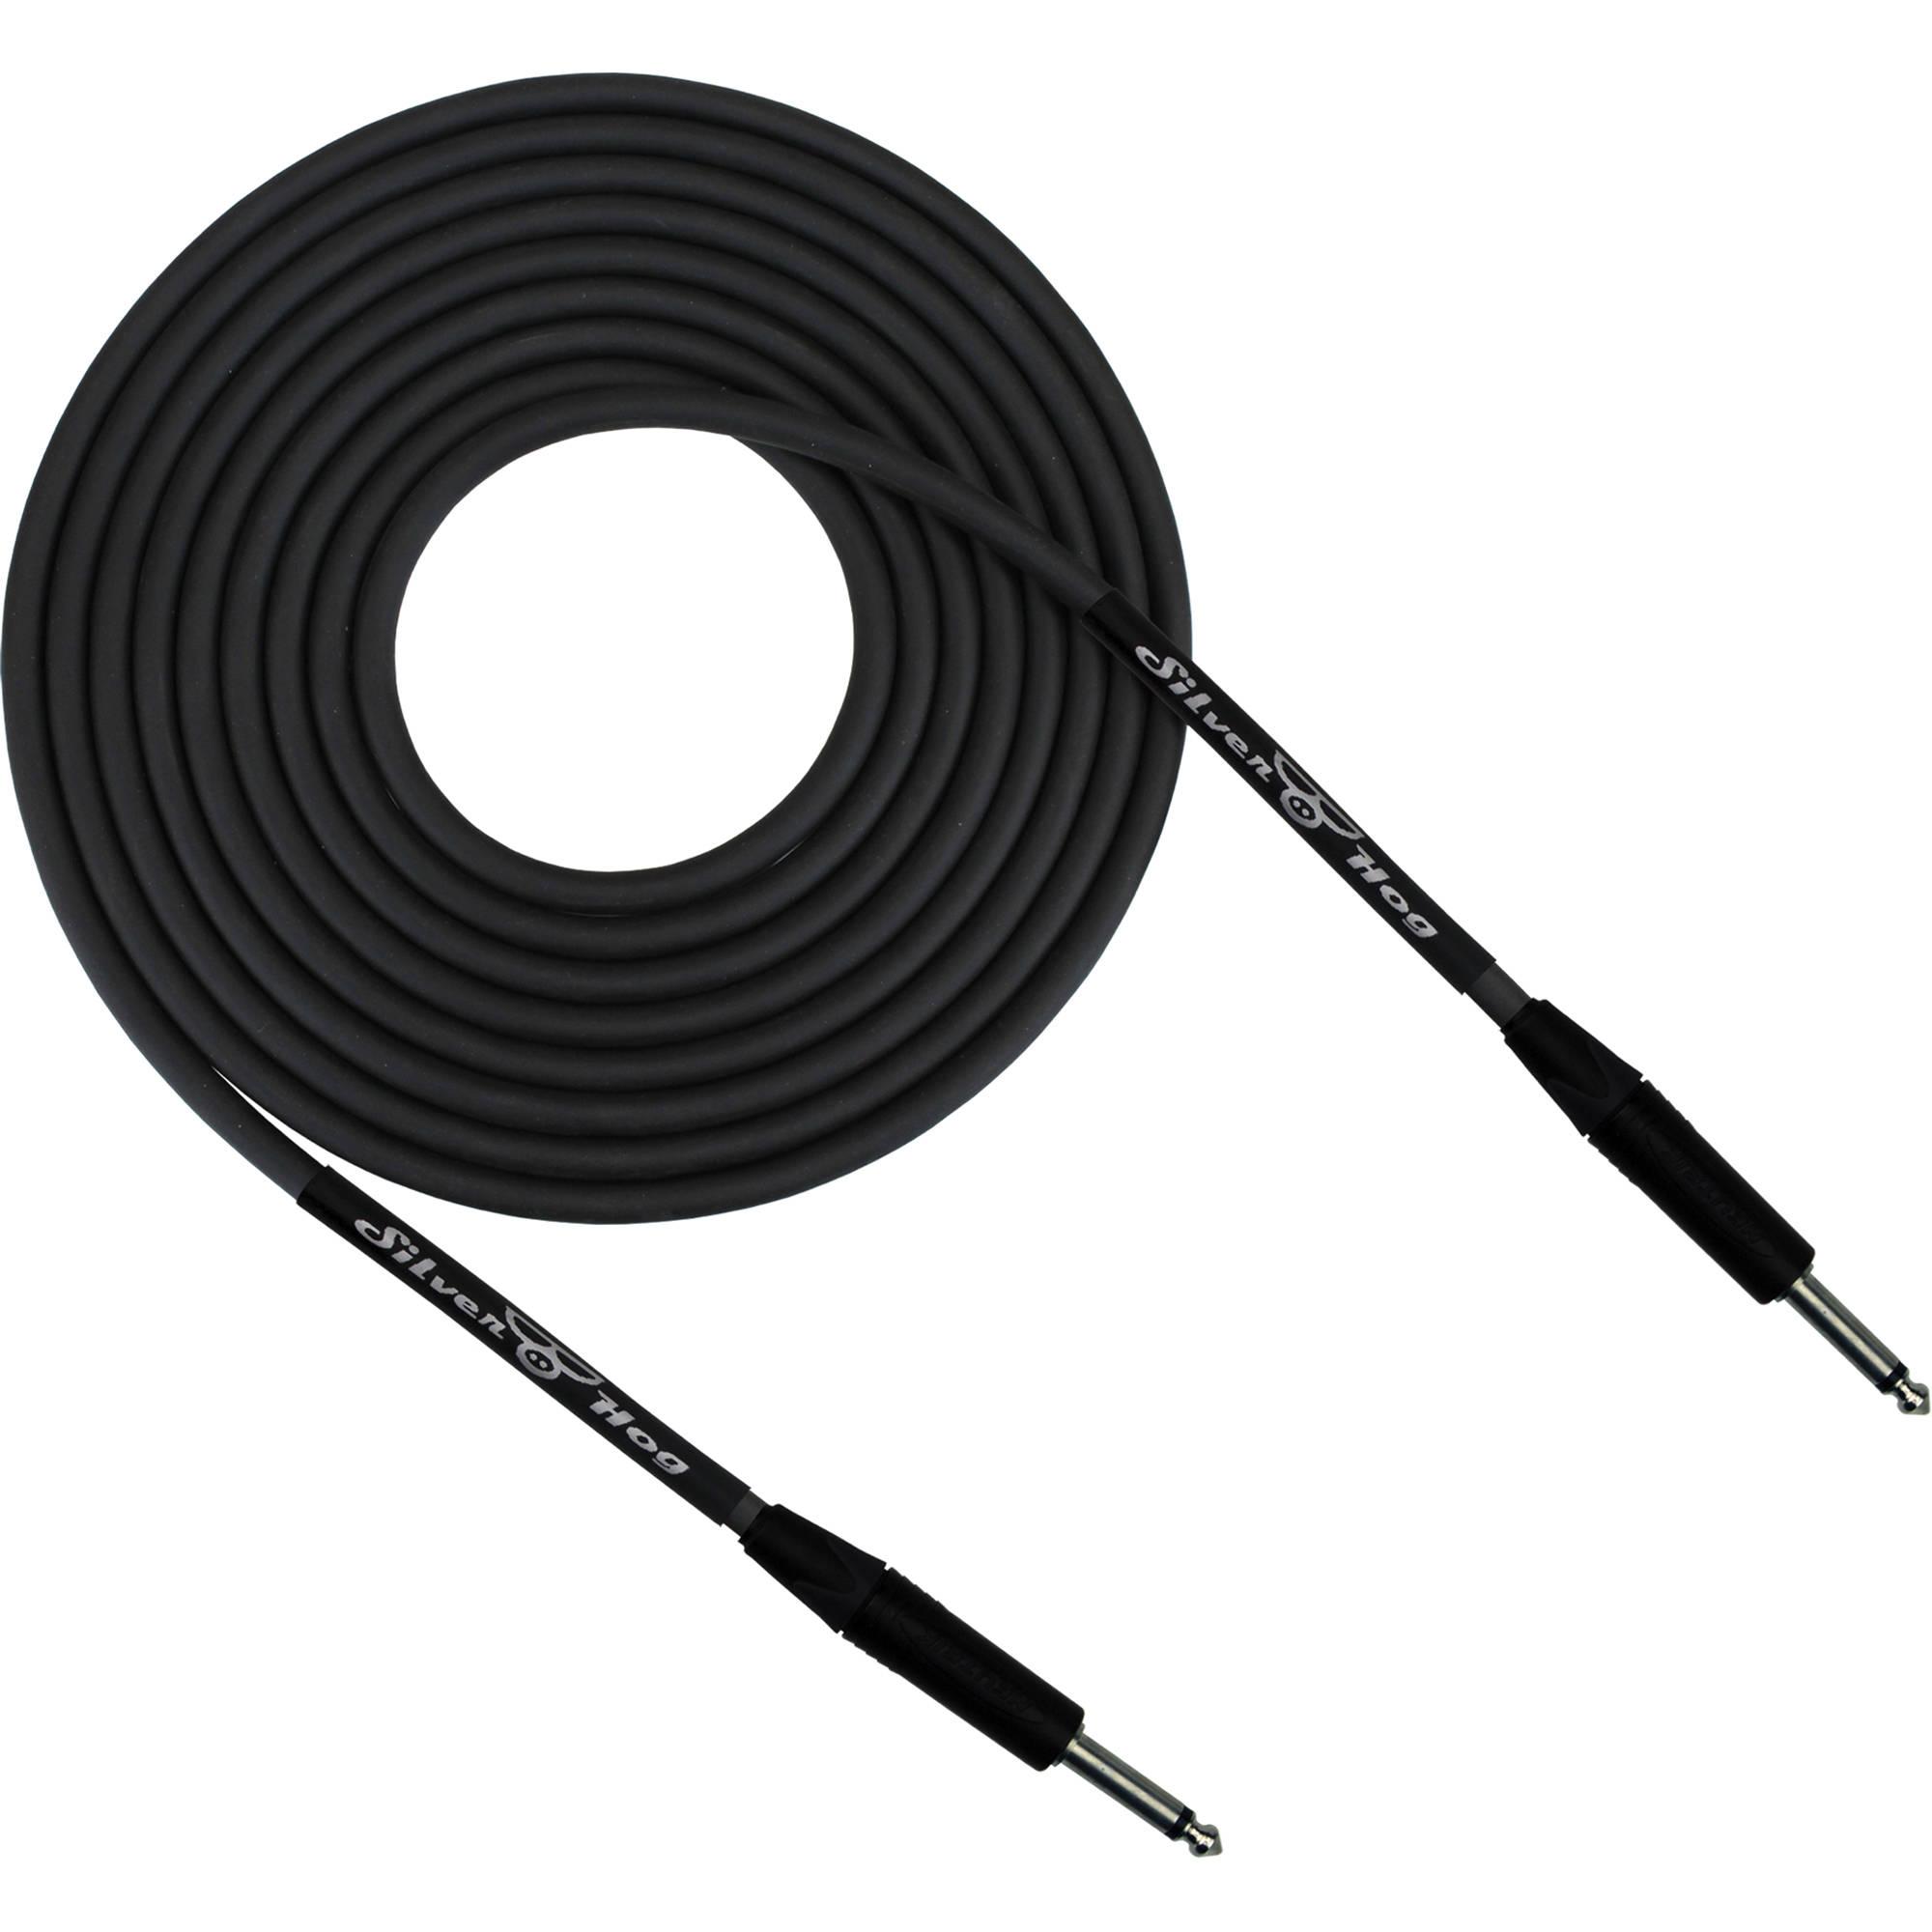 rapcohorizon silverhog guitar cable with neutrik slvrhog 8 b h. Black Bedroom Furniture Sets. Home Design Ideas